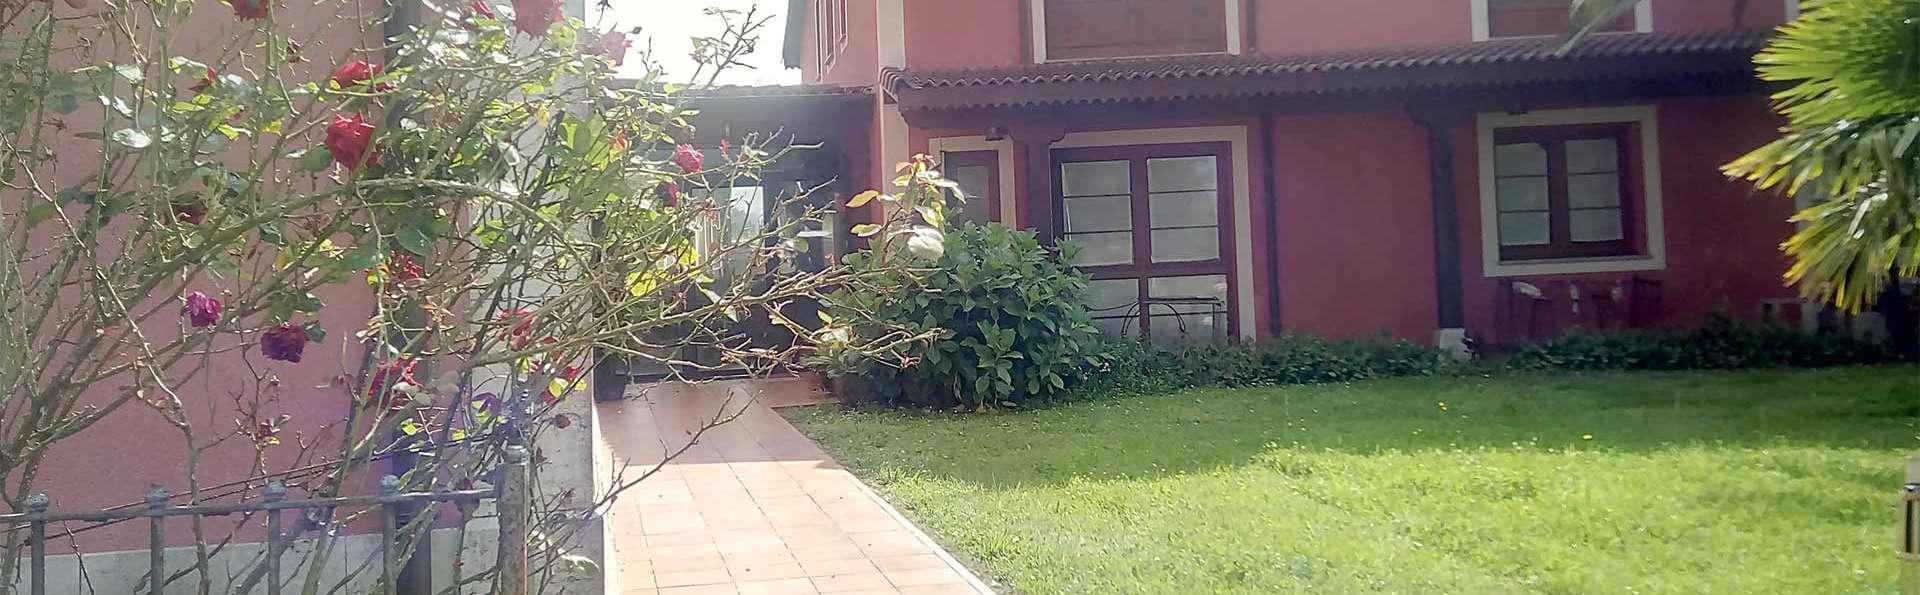 Hotel Casa Vitorio - EDIT_EXTERIOR_01.jpg